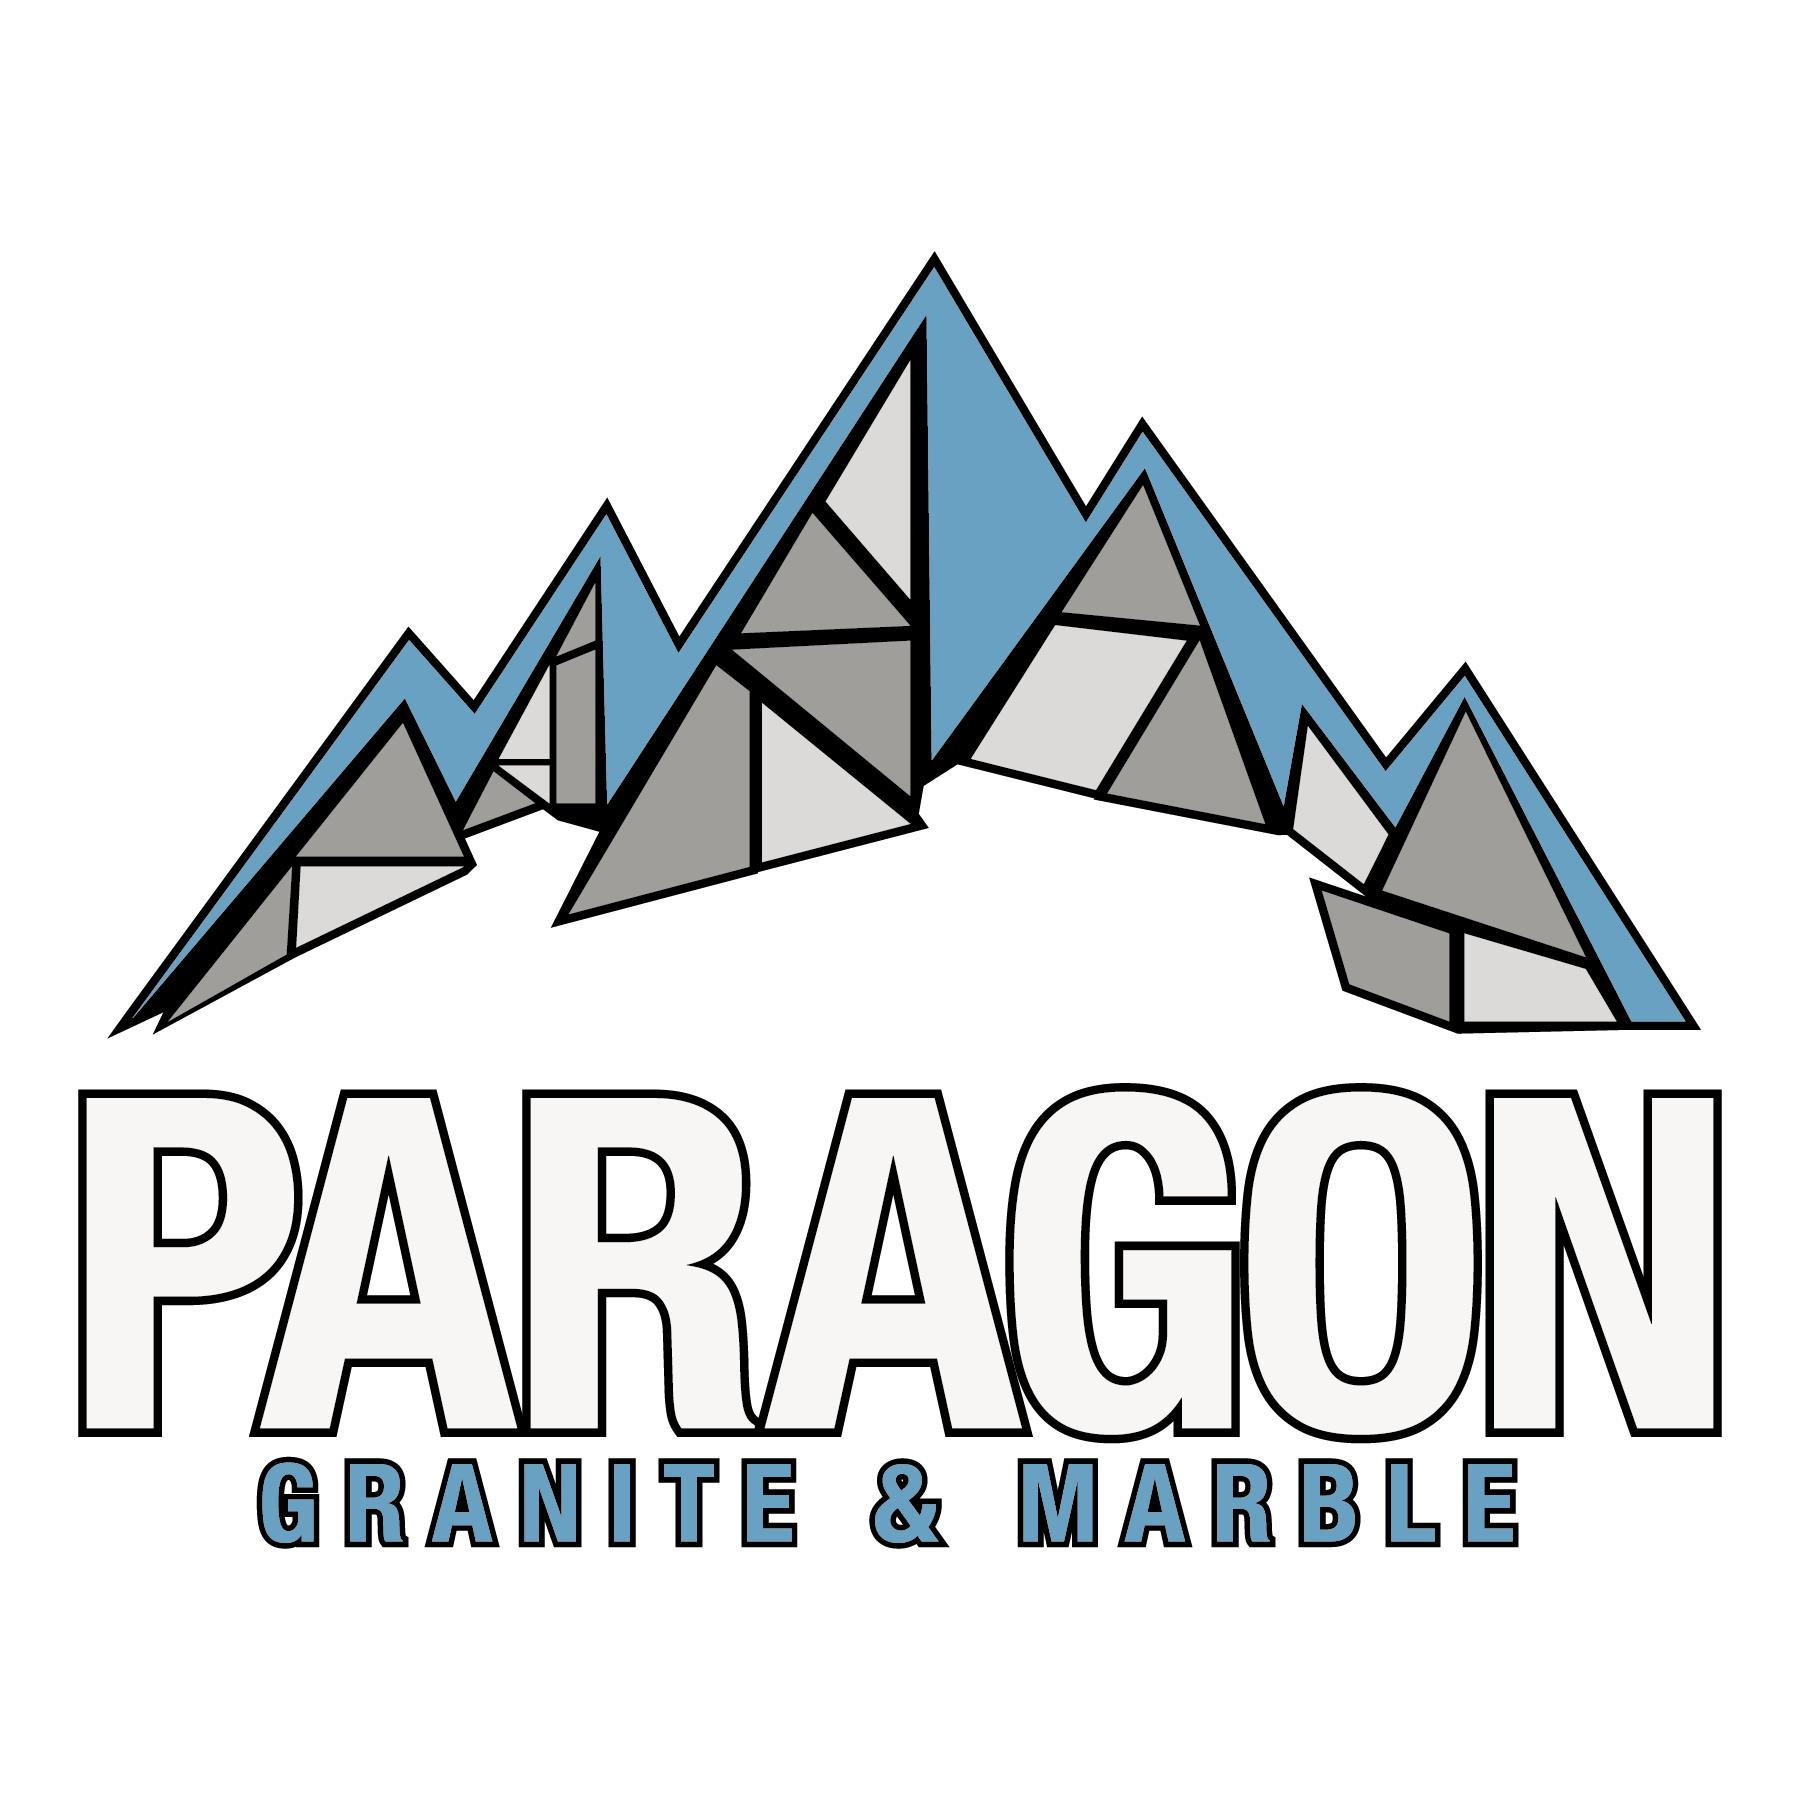 Paragon Granite and Marble